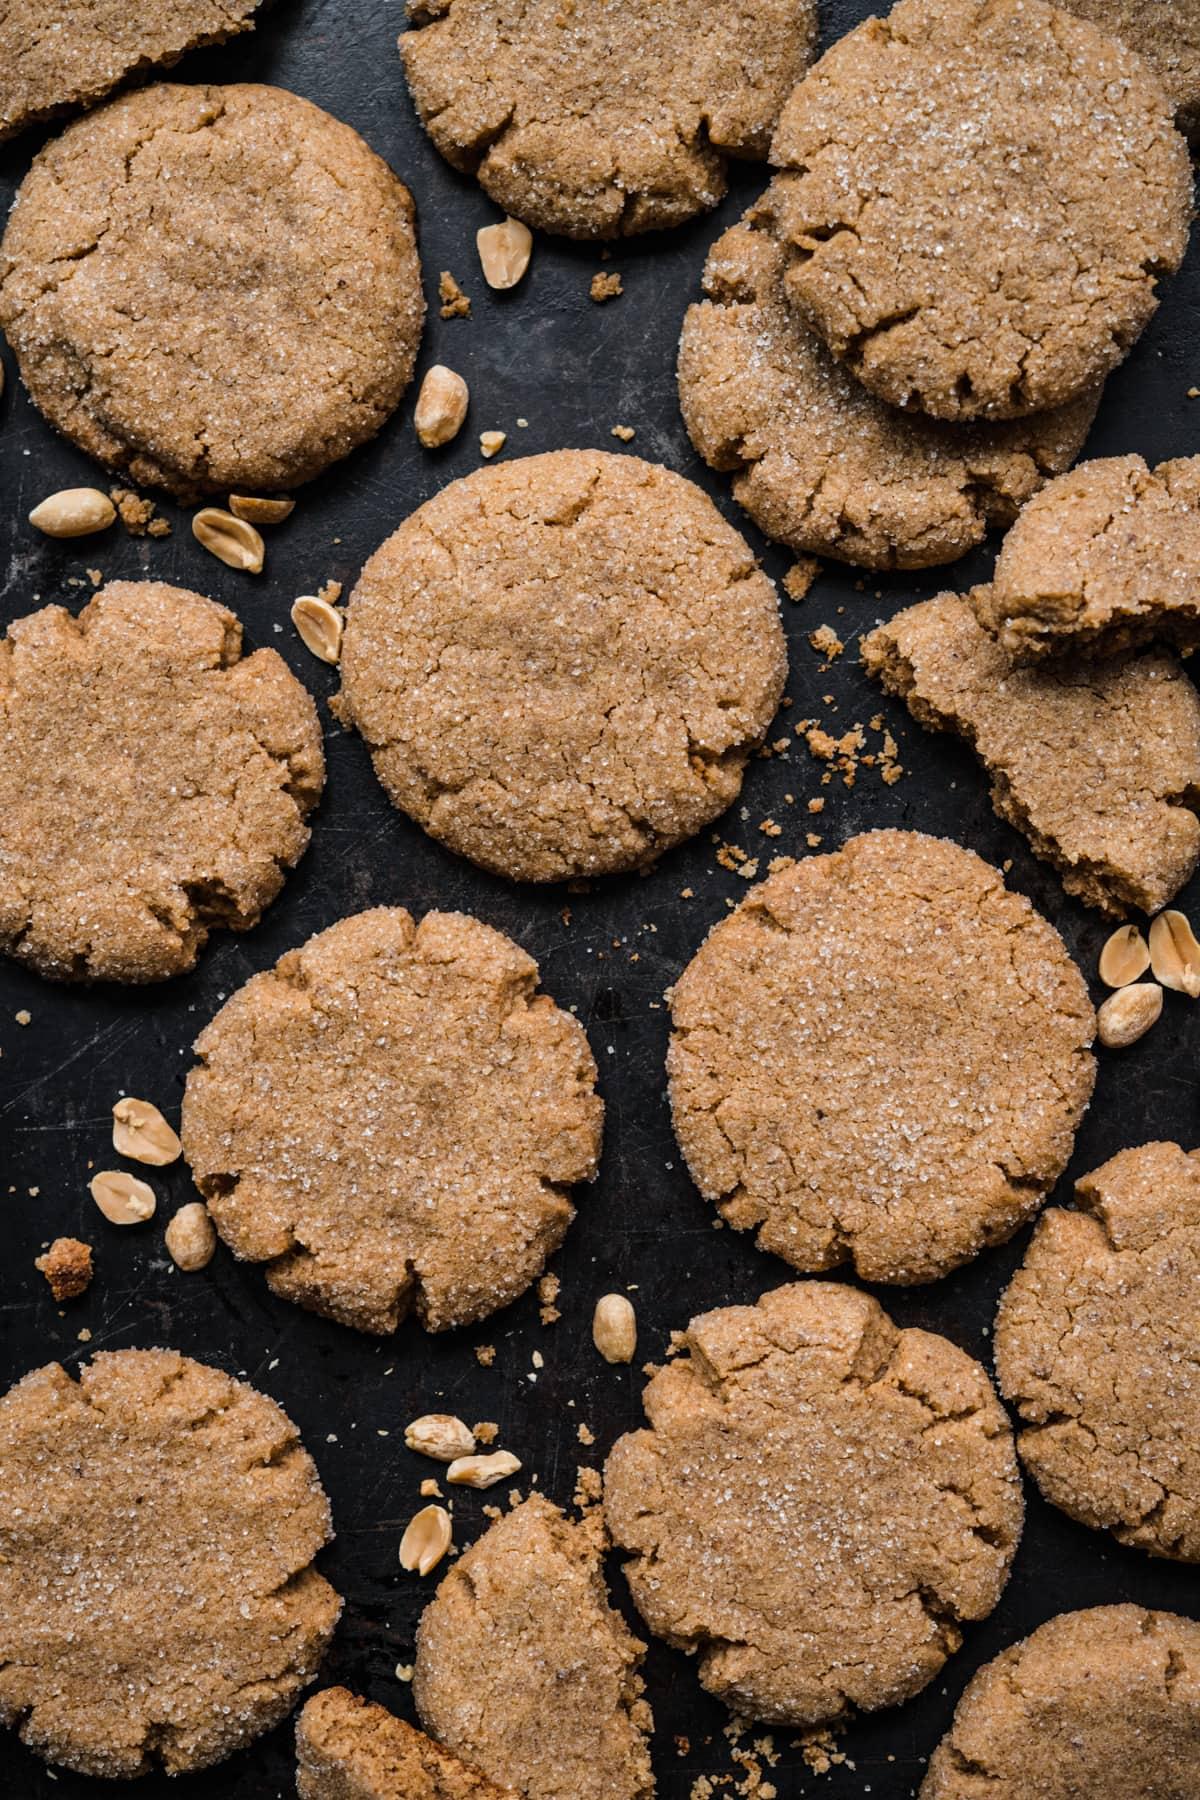 overhead view of vegan peanut butter cookies on baking sheet.